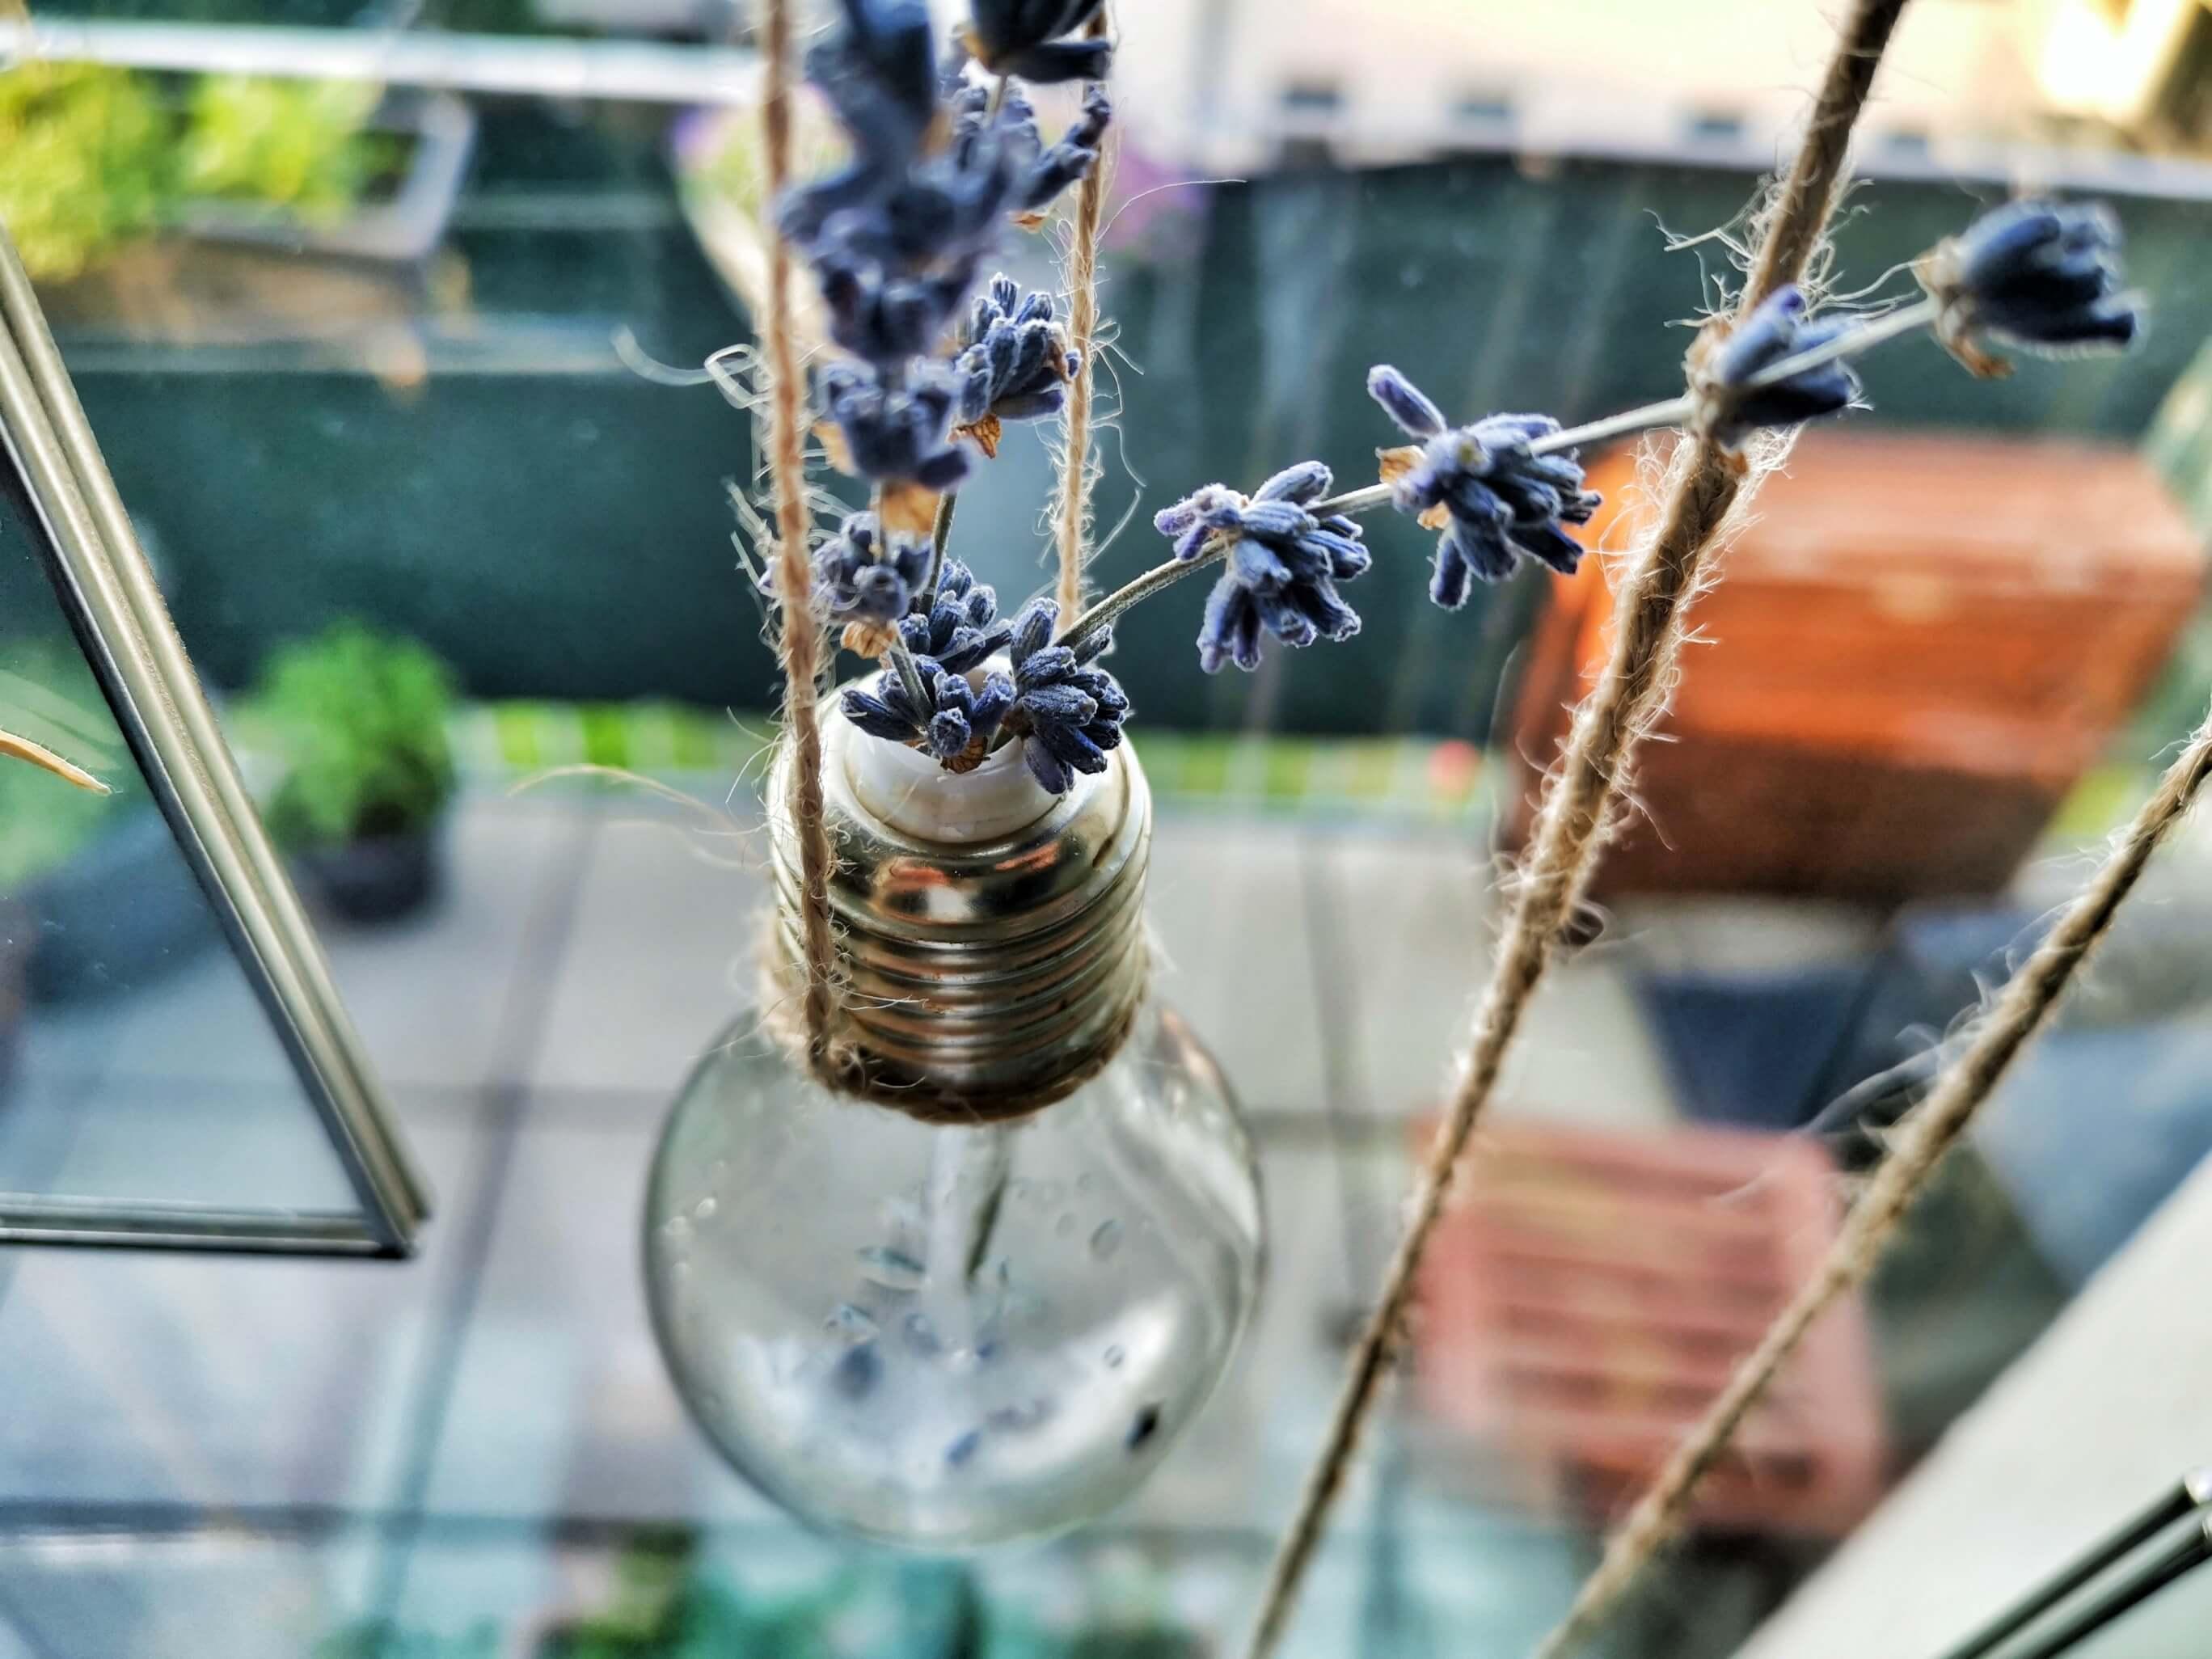 IMG 20190501 185622 01 resized 20190513 100713009 1 - Botanische Fensterdekoration: Herbarium statt Gardinen